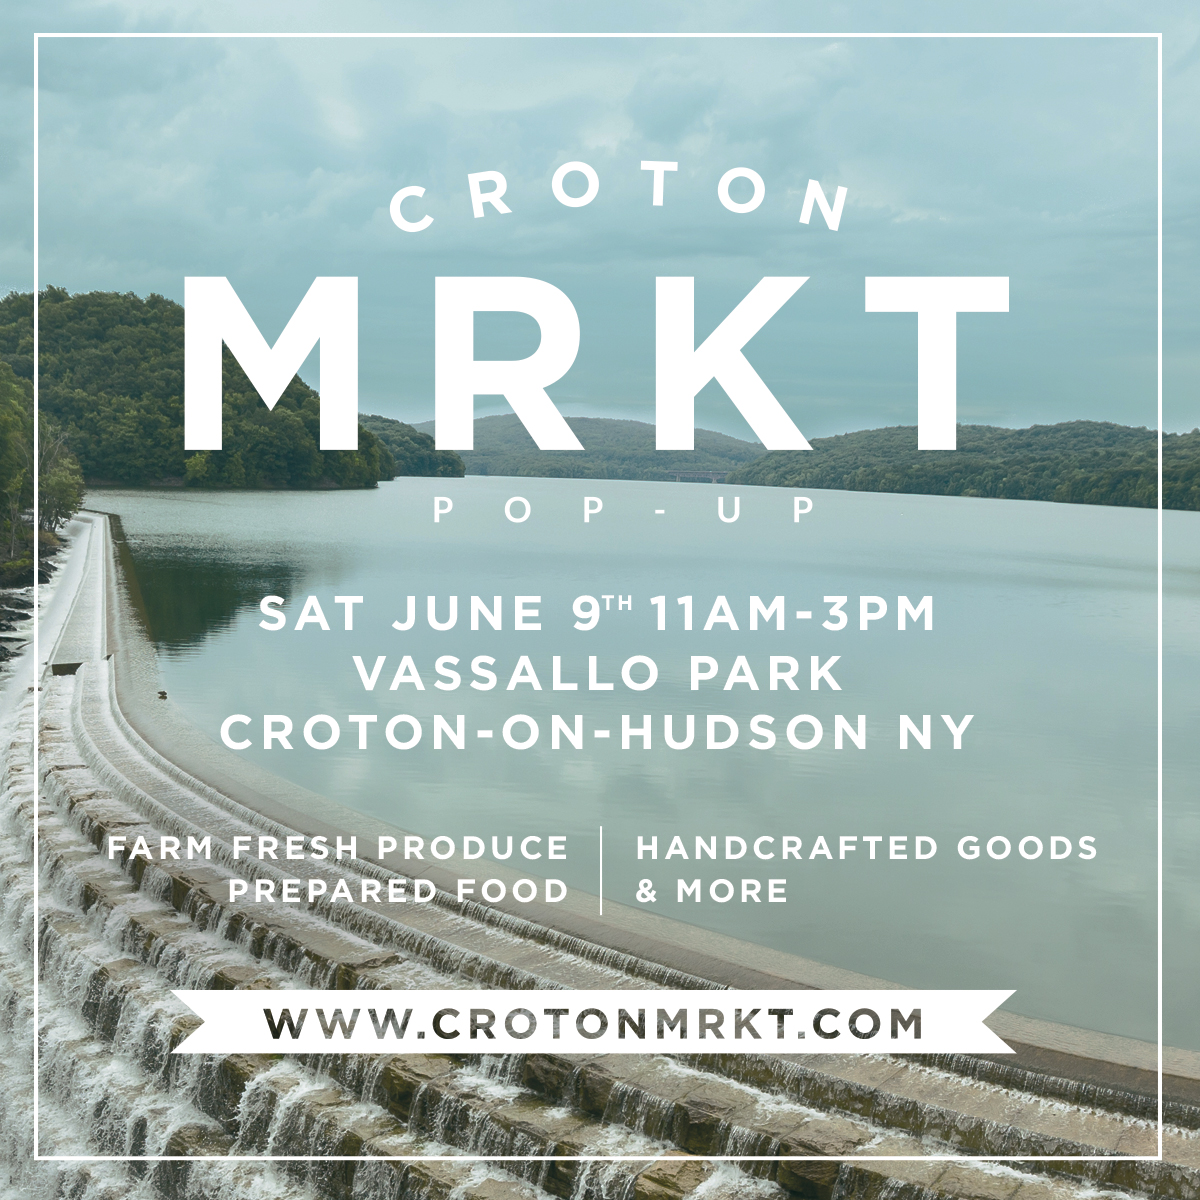 Croton MRKT: Fun Pop-Up Market in Croton-on-Hudson